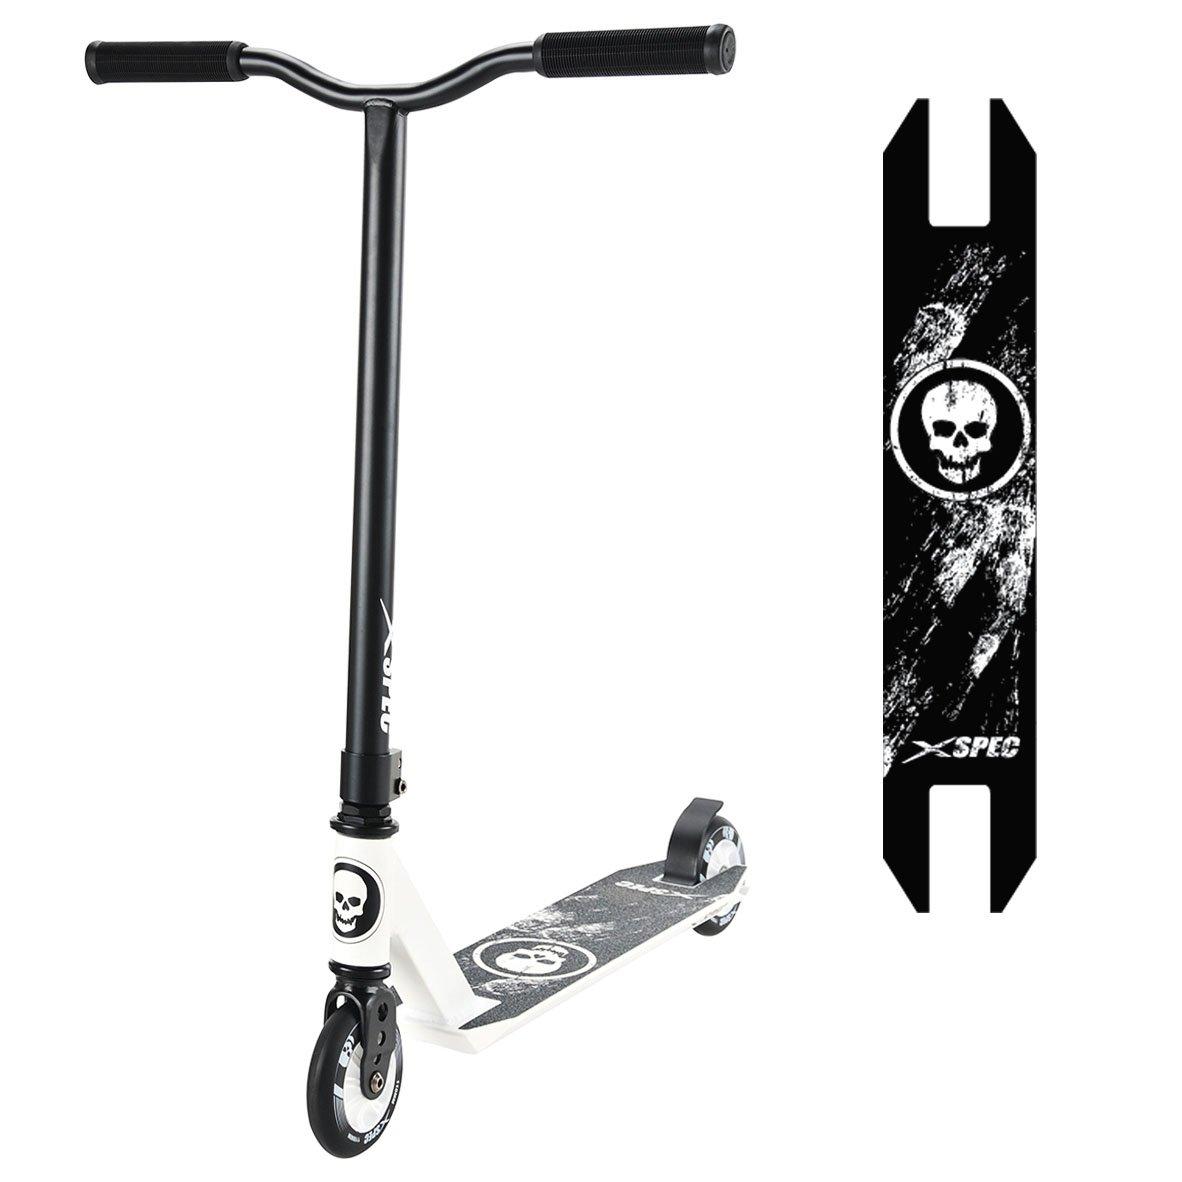 Xspec Pro Stunt Kick Scooter w/Strong 6061 Aluminum Deck - 220lb Weight Limit - TPR Rubber Hand Grips - ABEC-7 Bearing